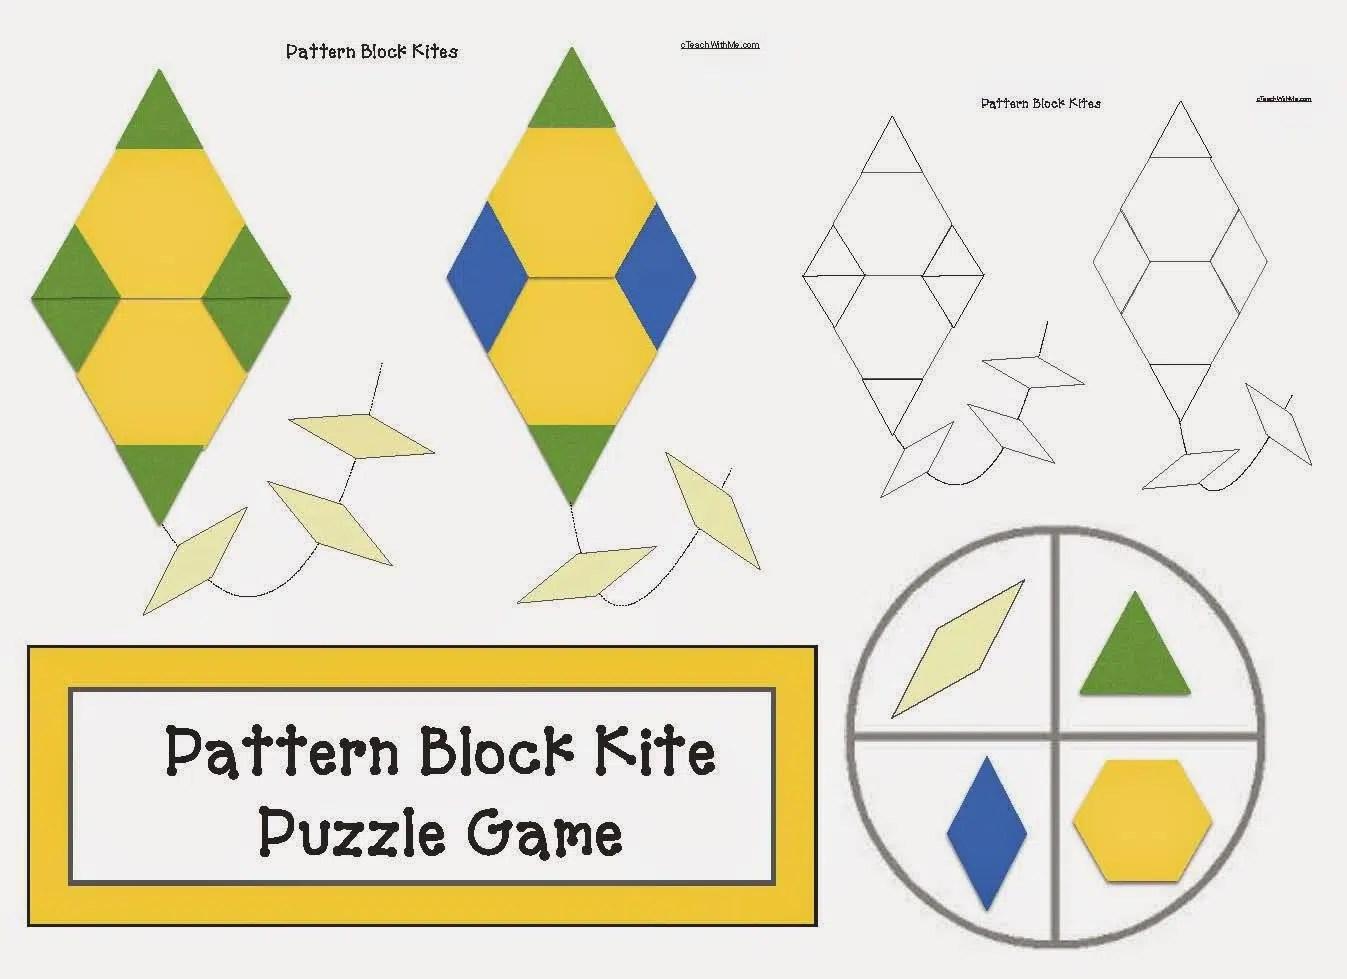 Pattern Block Kite Puzzle Games